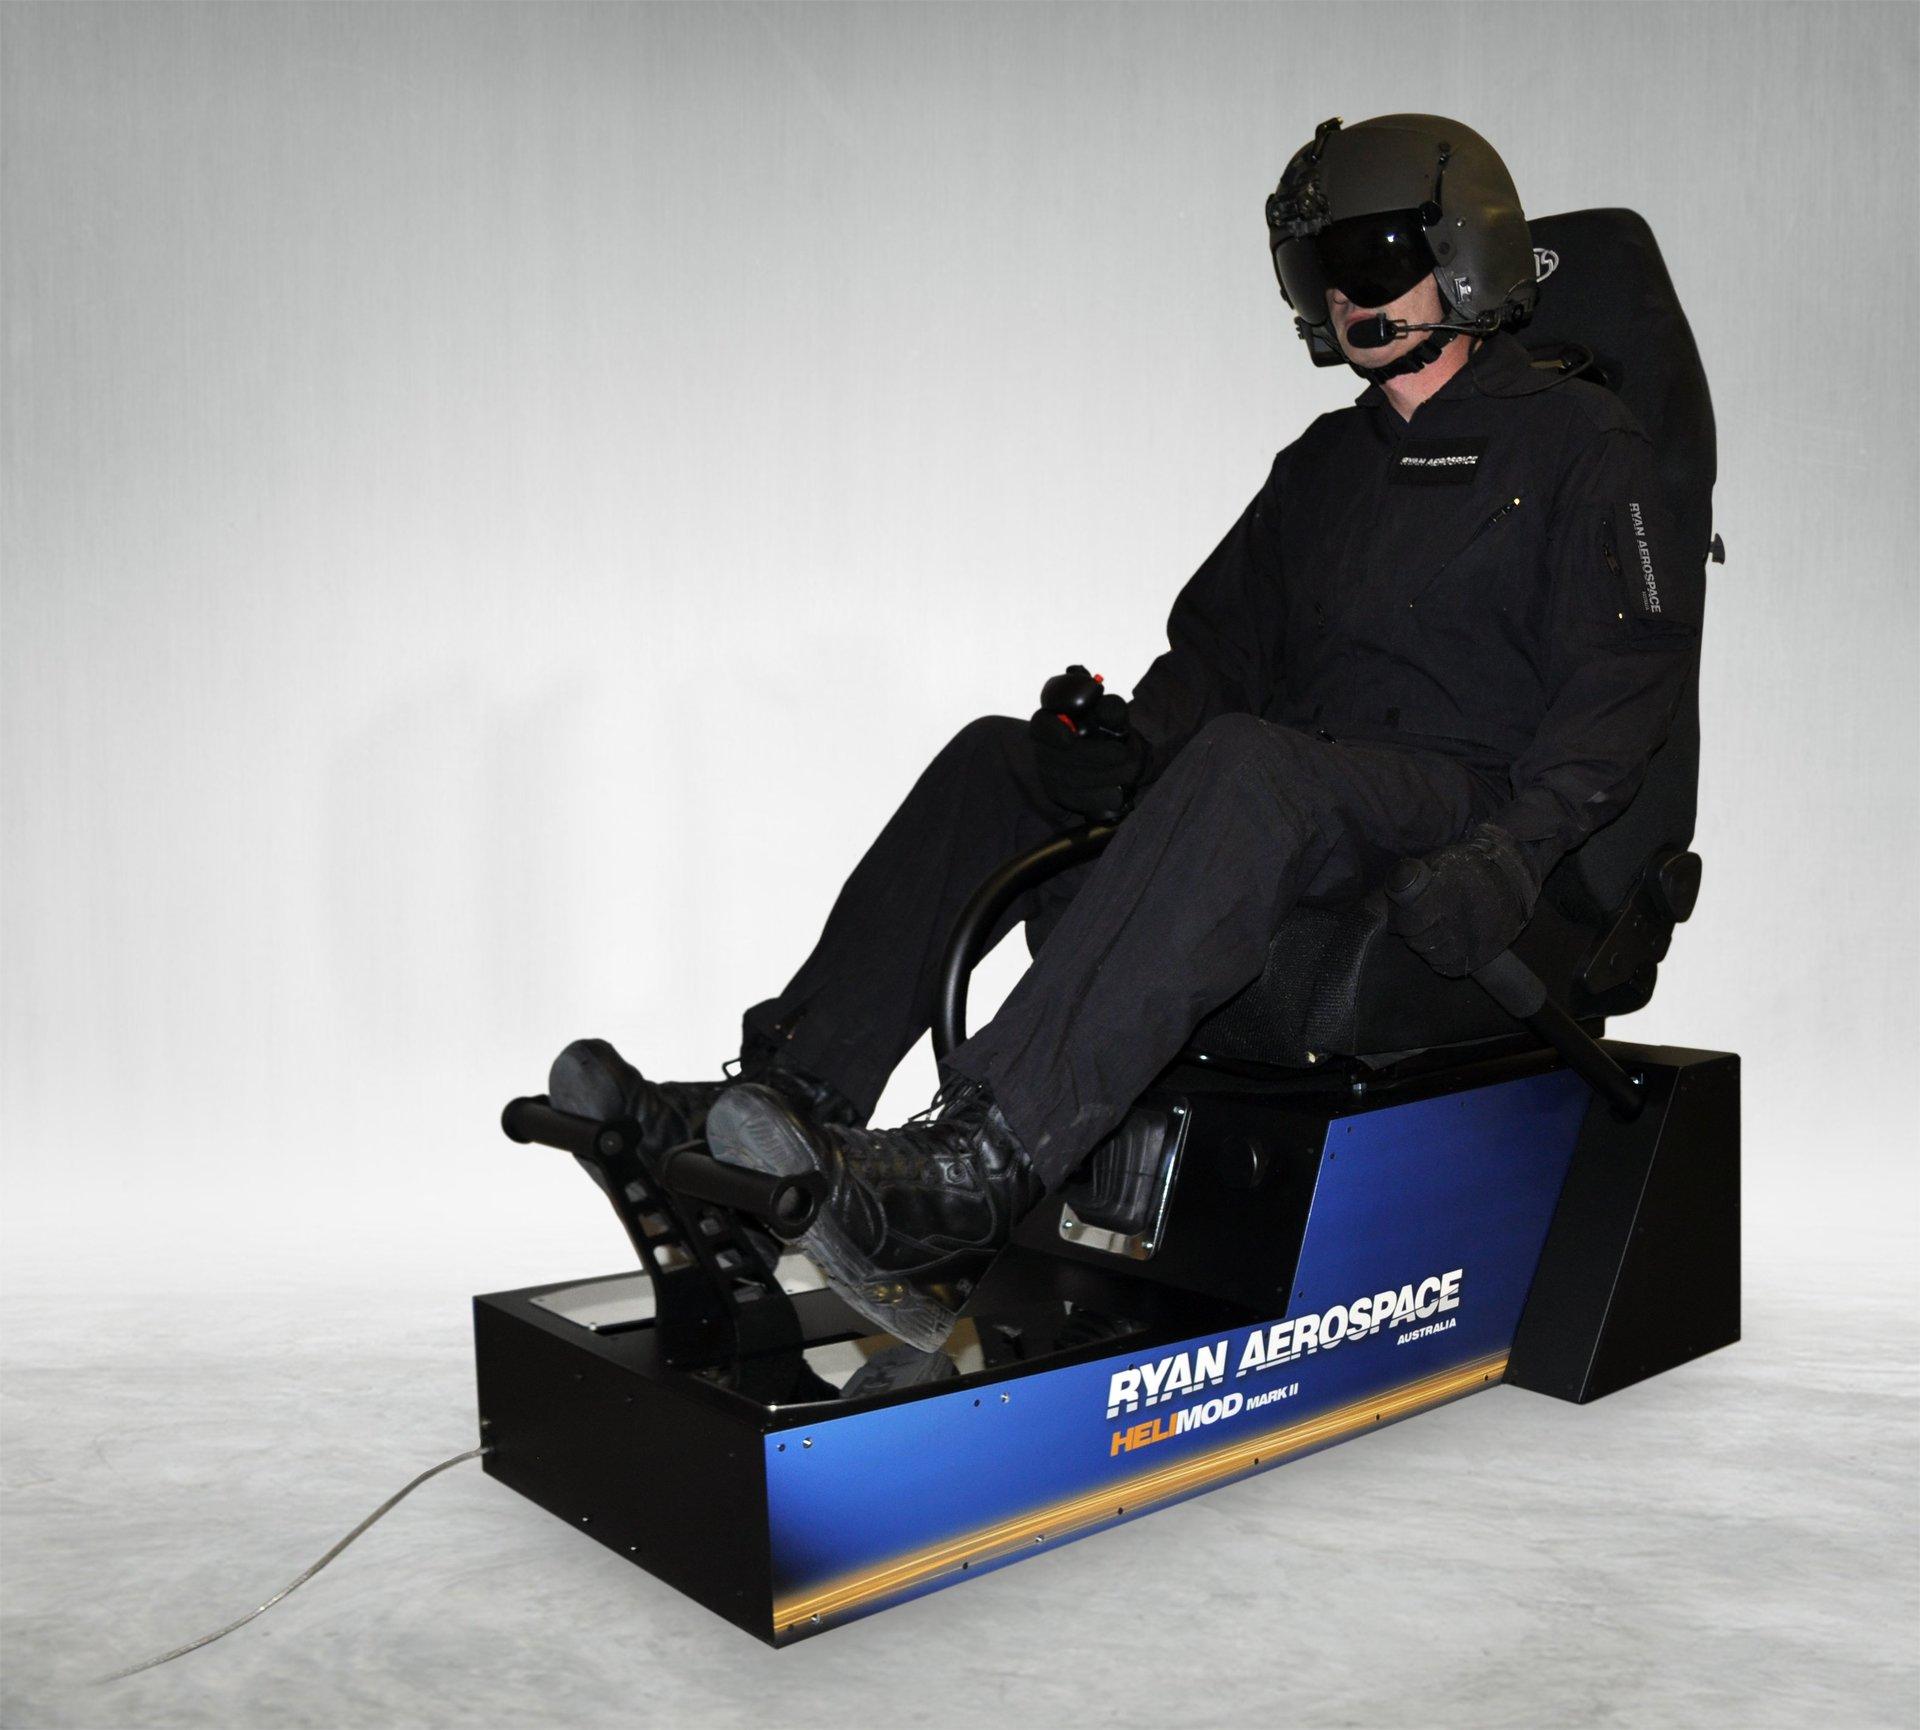 Ryan Aerospace HELIMOD